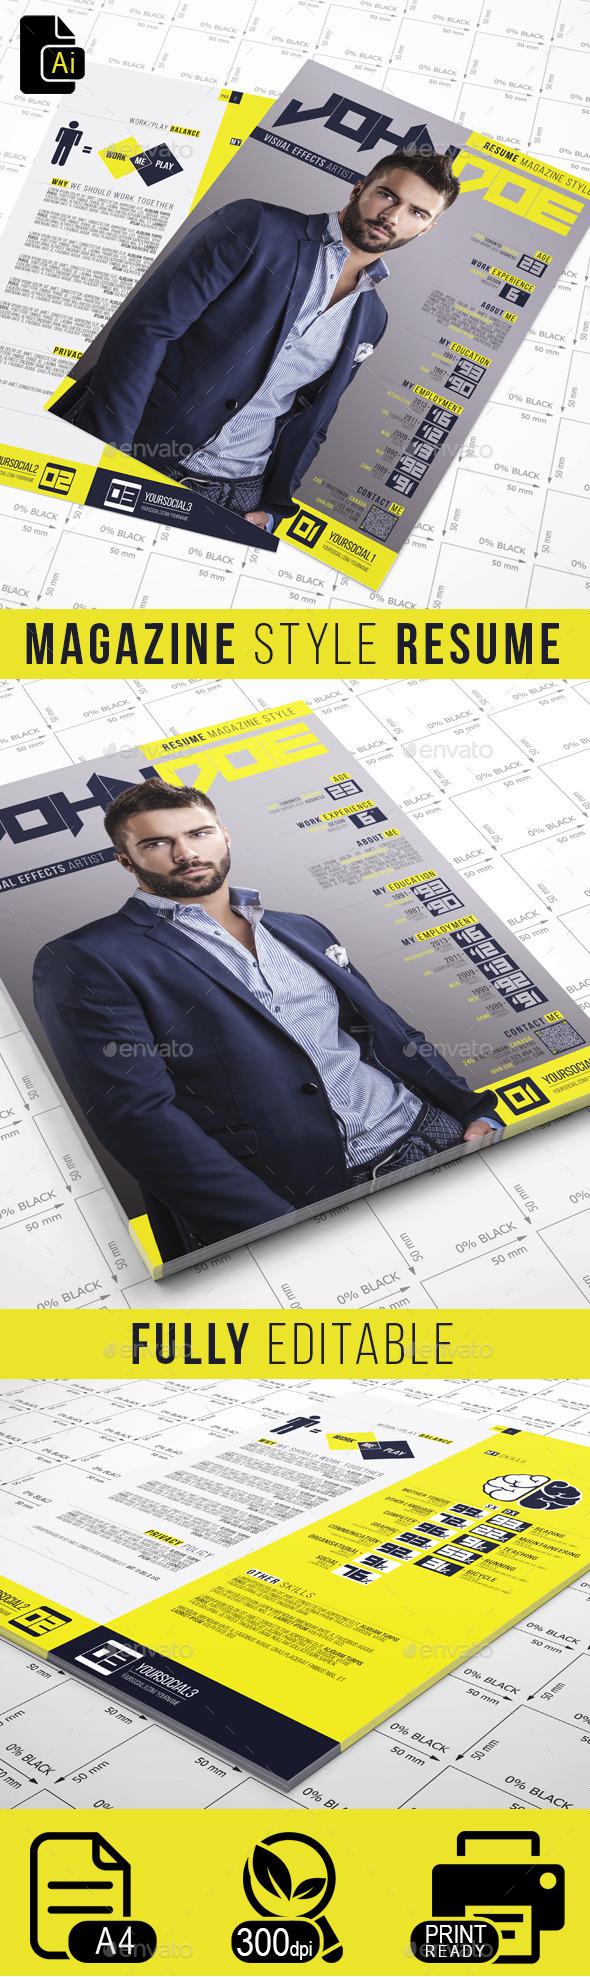 GraphicRiver Magazine Style Resume 10050021